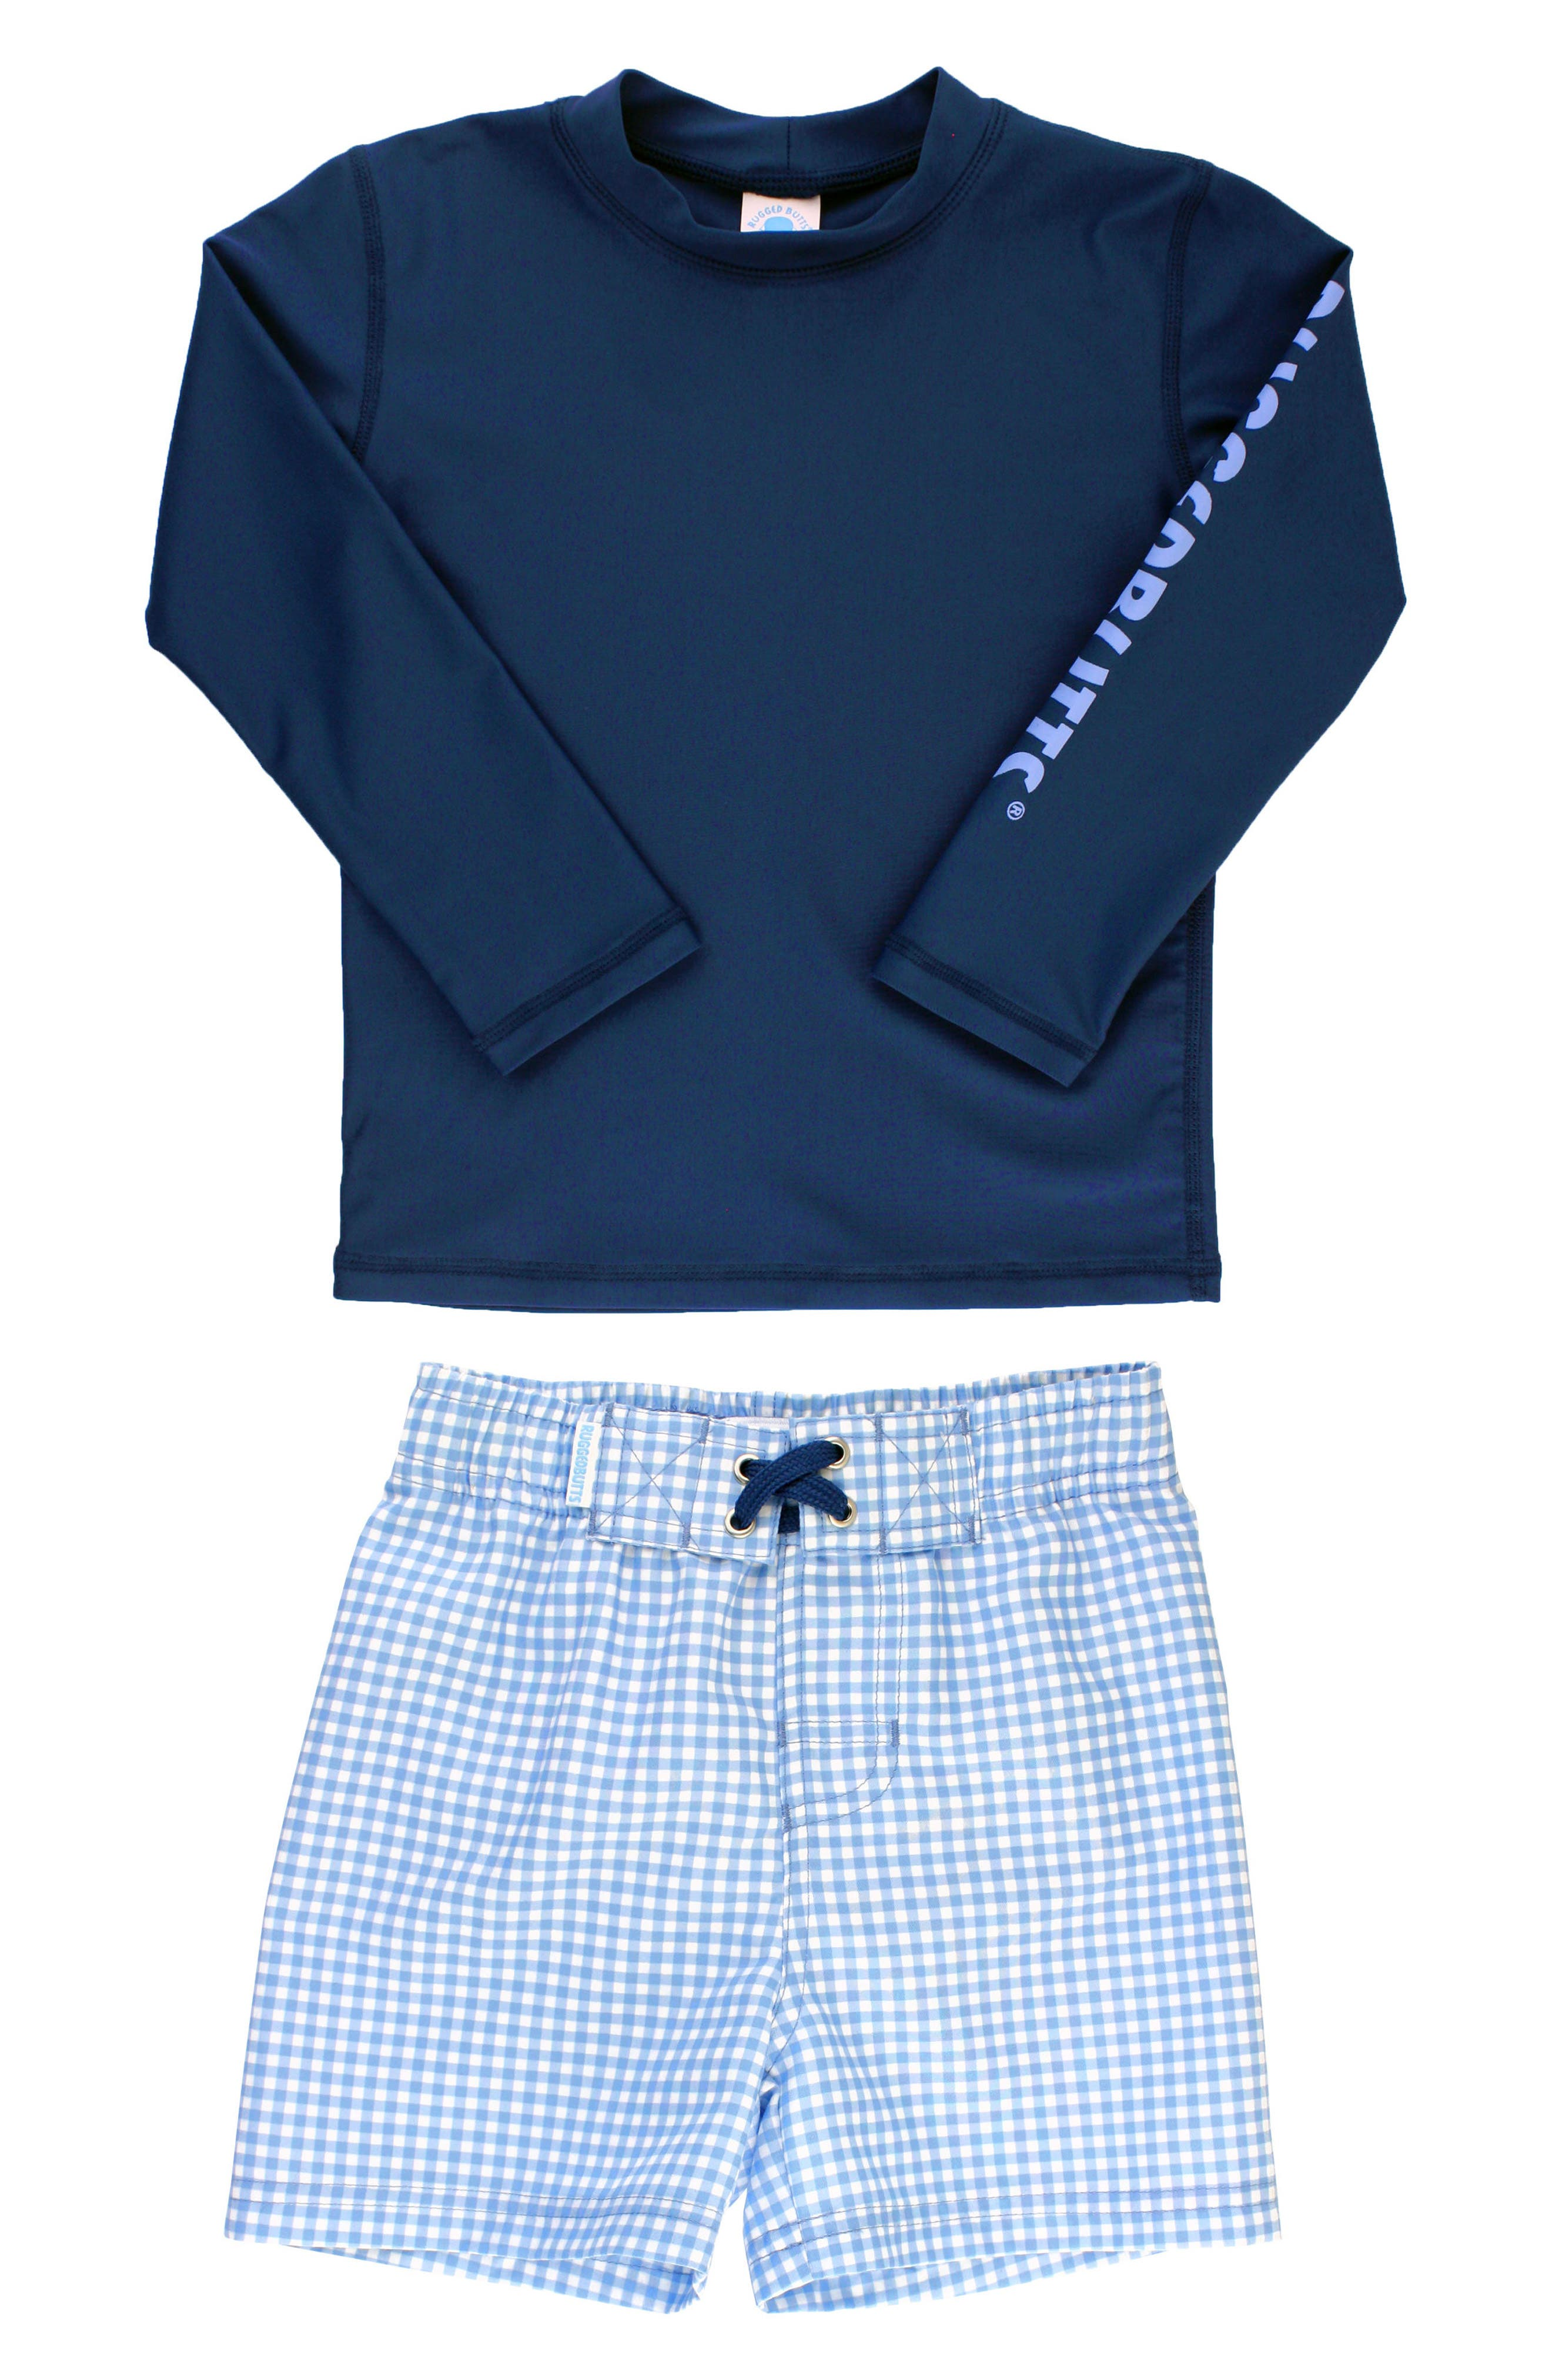 Long Sleeve Rashguard & Gingham Board Shorts Set,                             Main thumbnail 1, color,                             Navy